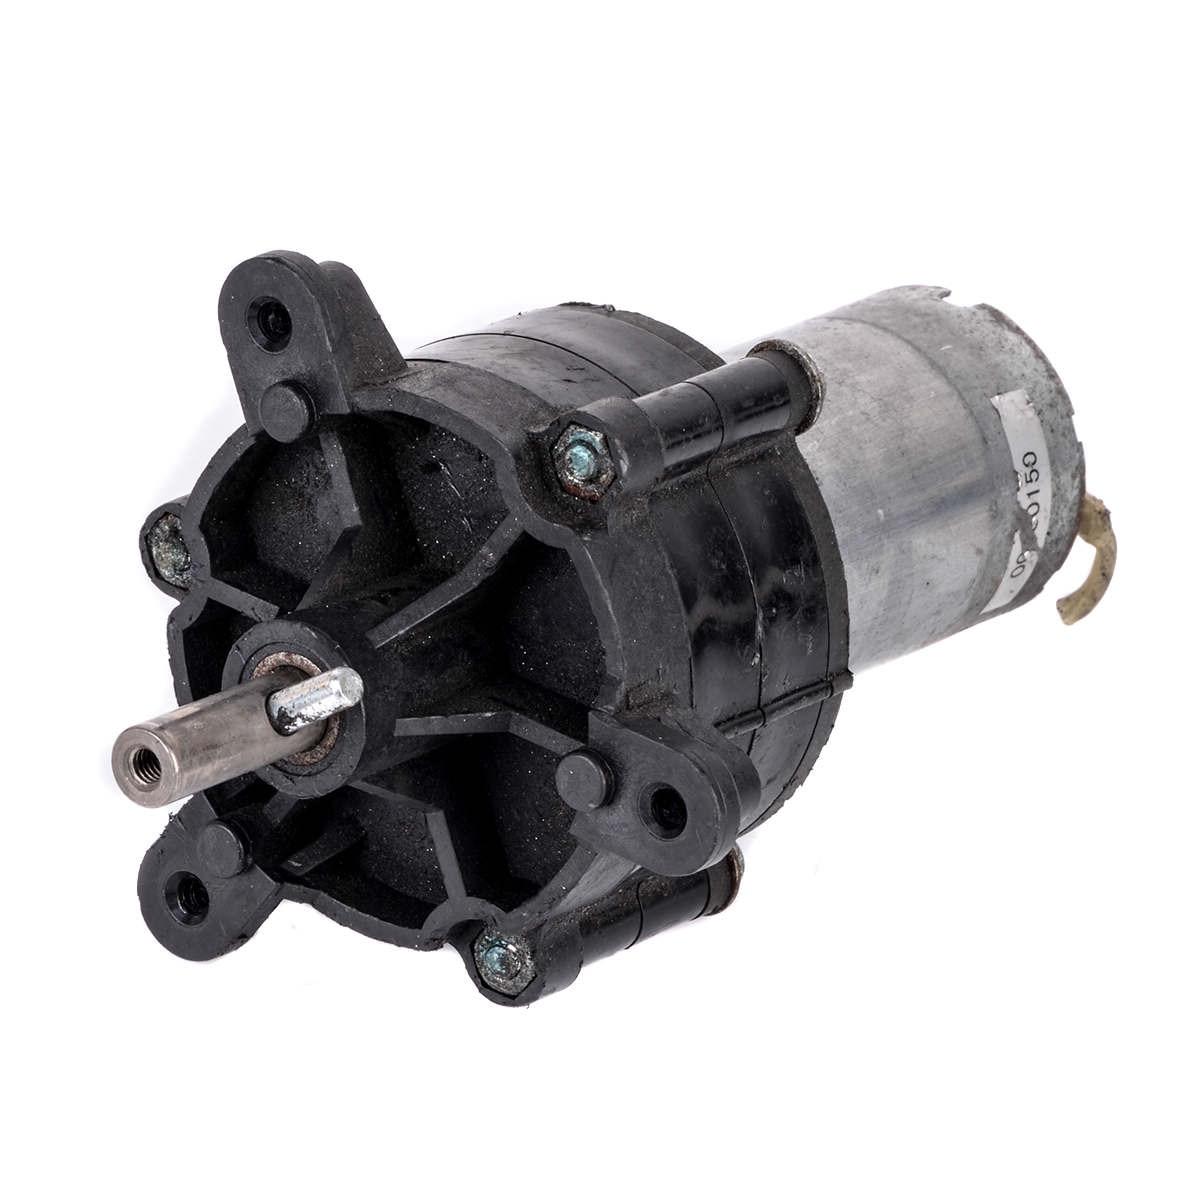 High Quality 1500mA 20W  Wind DC Generator Hand Dynamo Hydraulic Test 5v/6v/12v/24v Motor Mayitr Hot SellingHigh Quality 1500mA 20W  Wind DC Generator Hand Dynamo Hydraulic Test 5v/6v/12v/24v Motor Mayitr Hot Selling